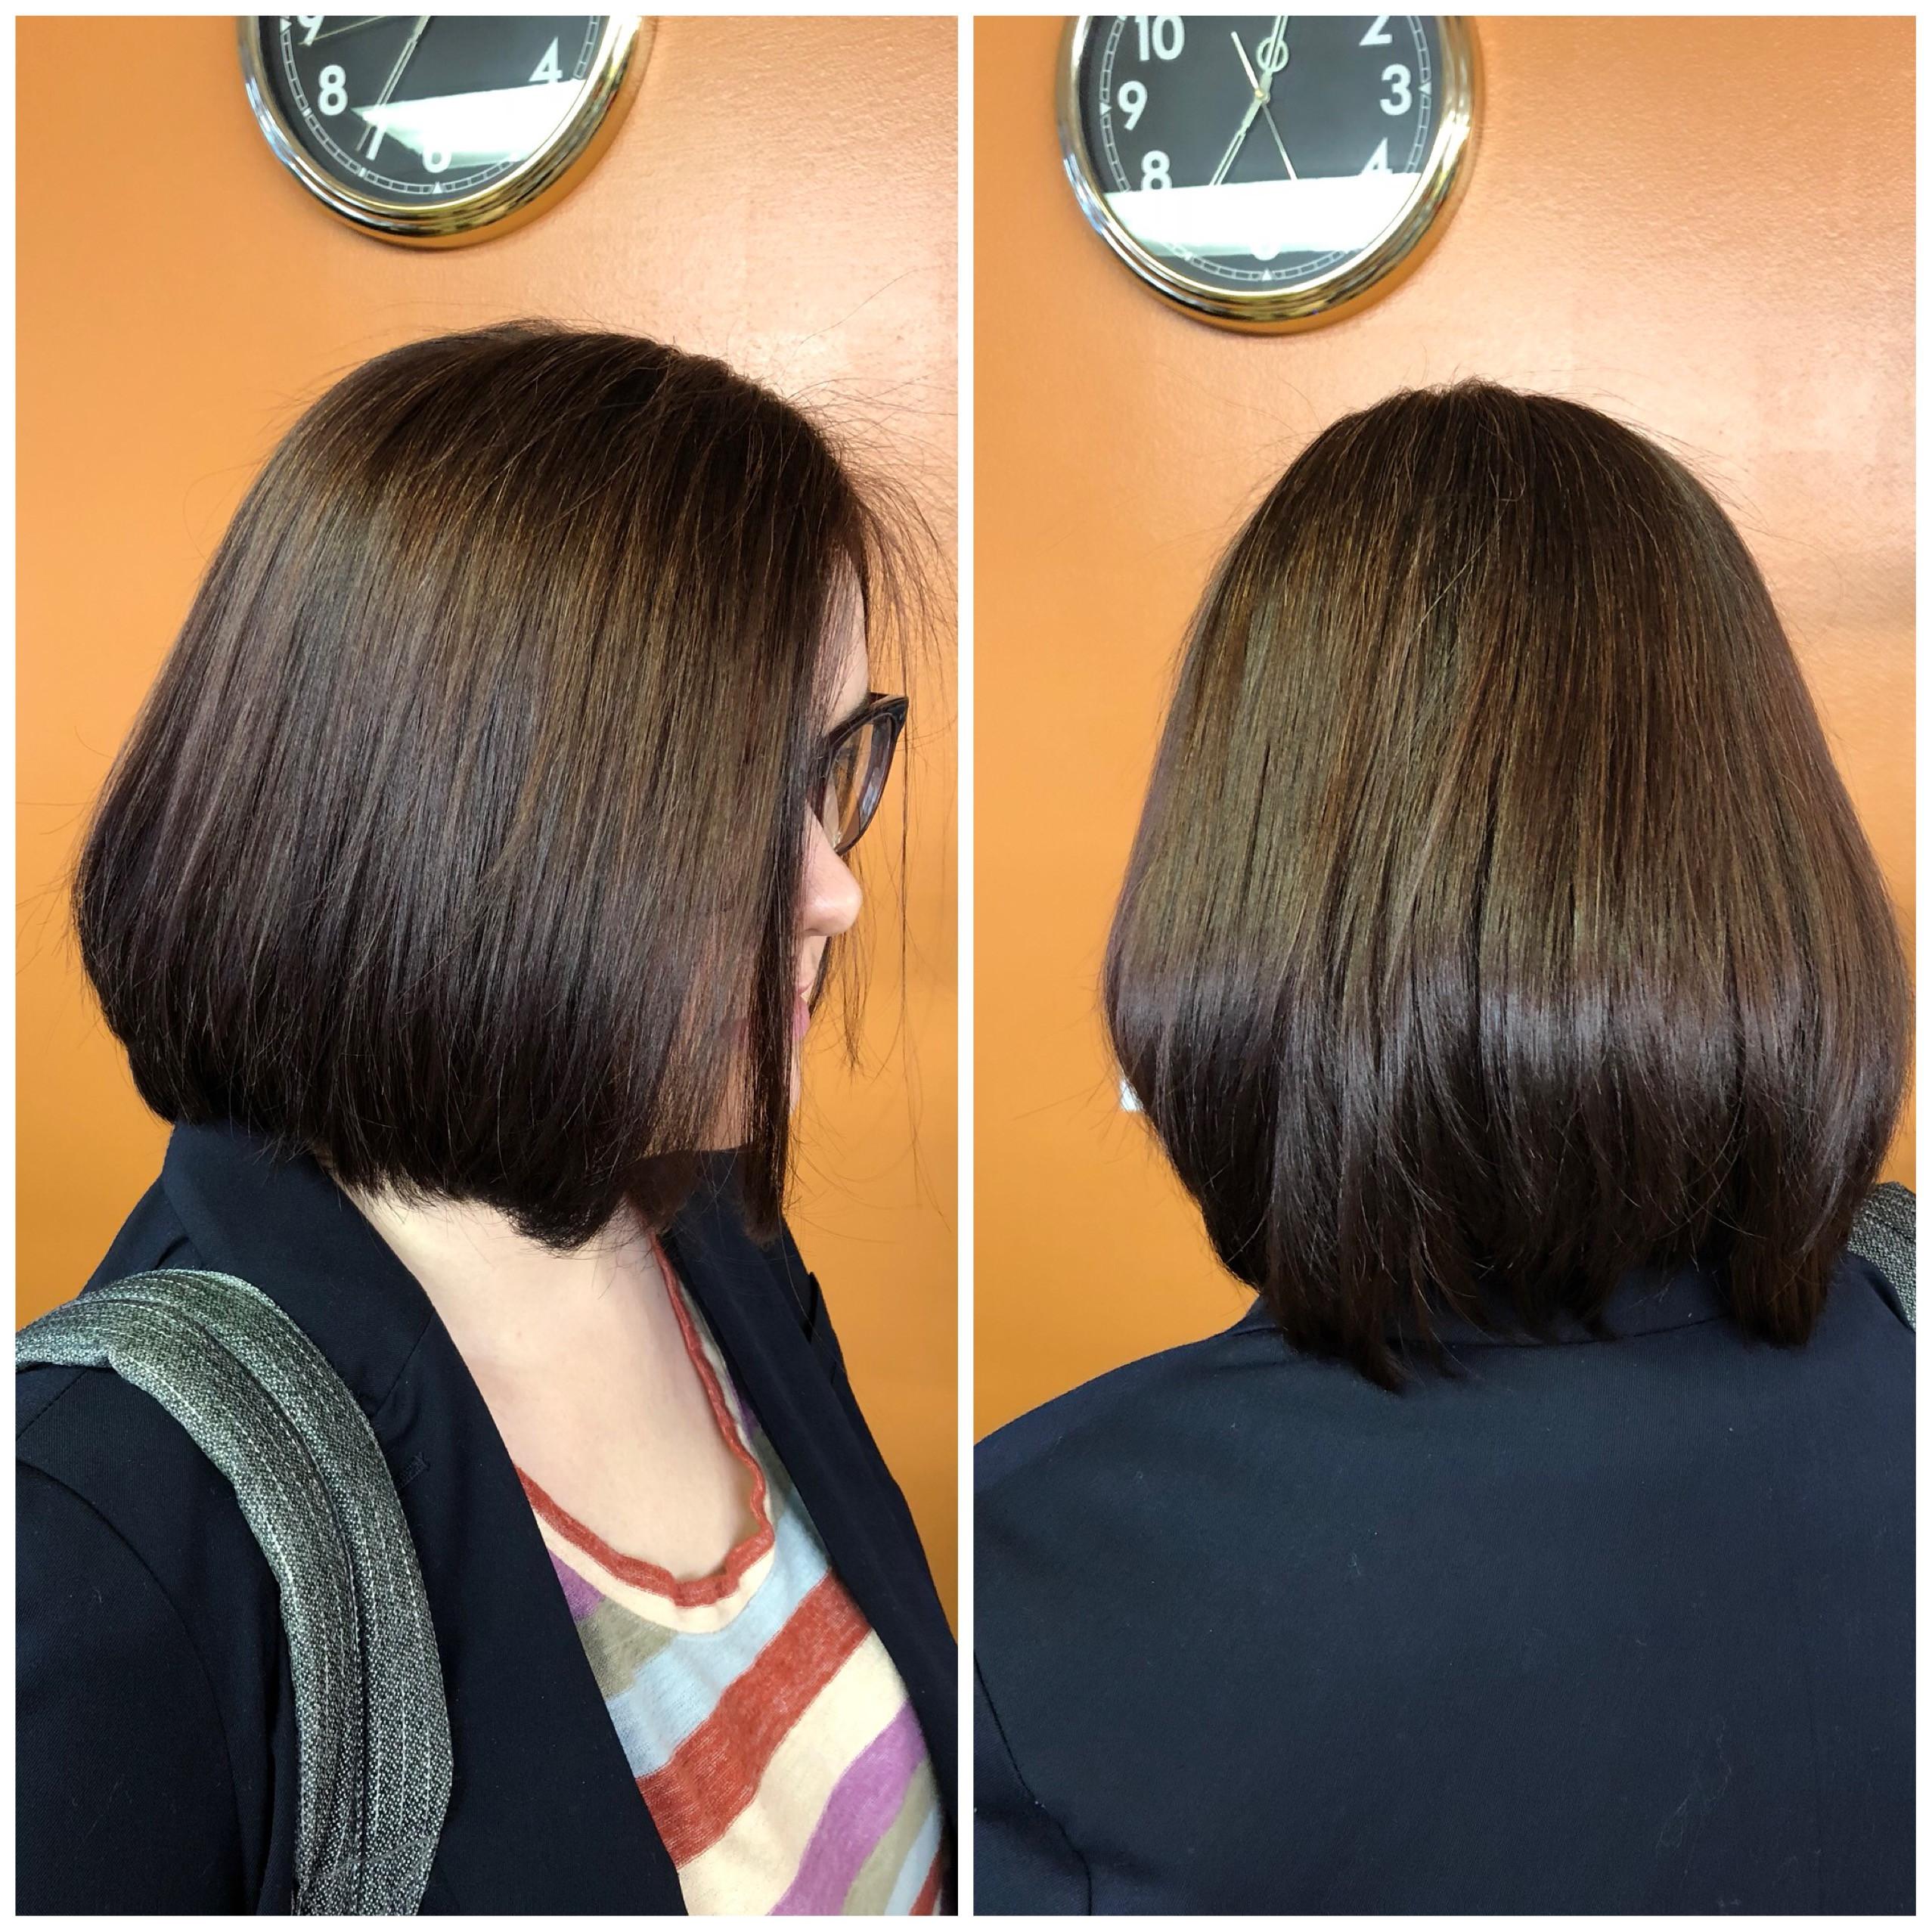 Haircut for Women